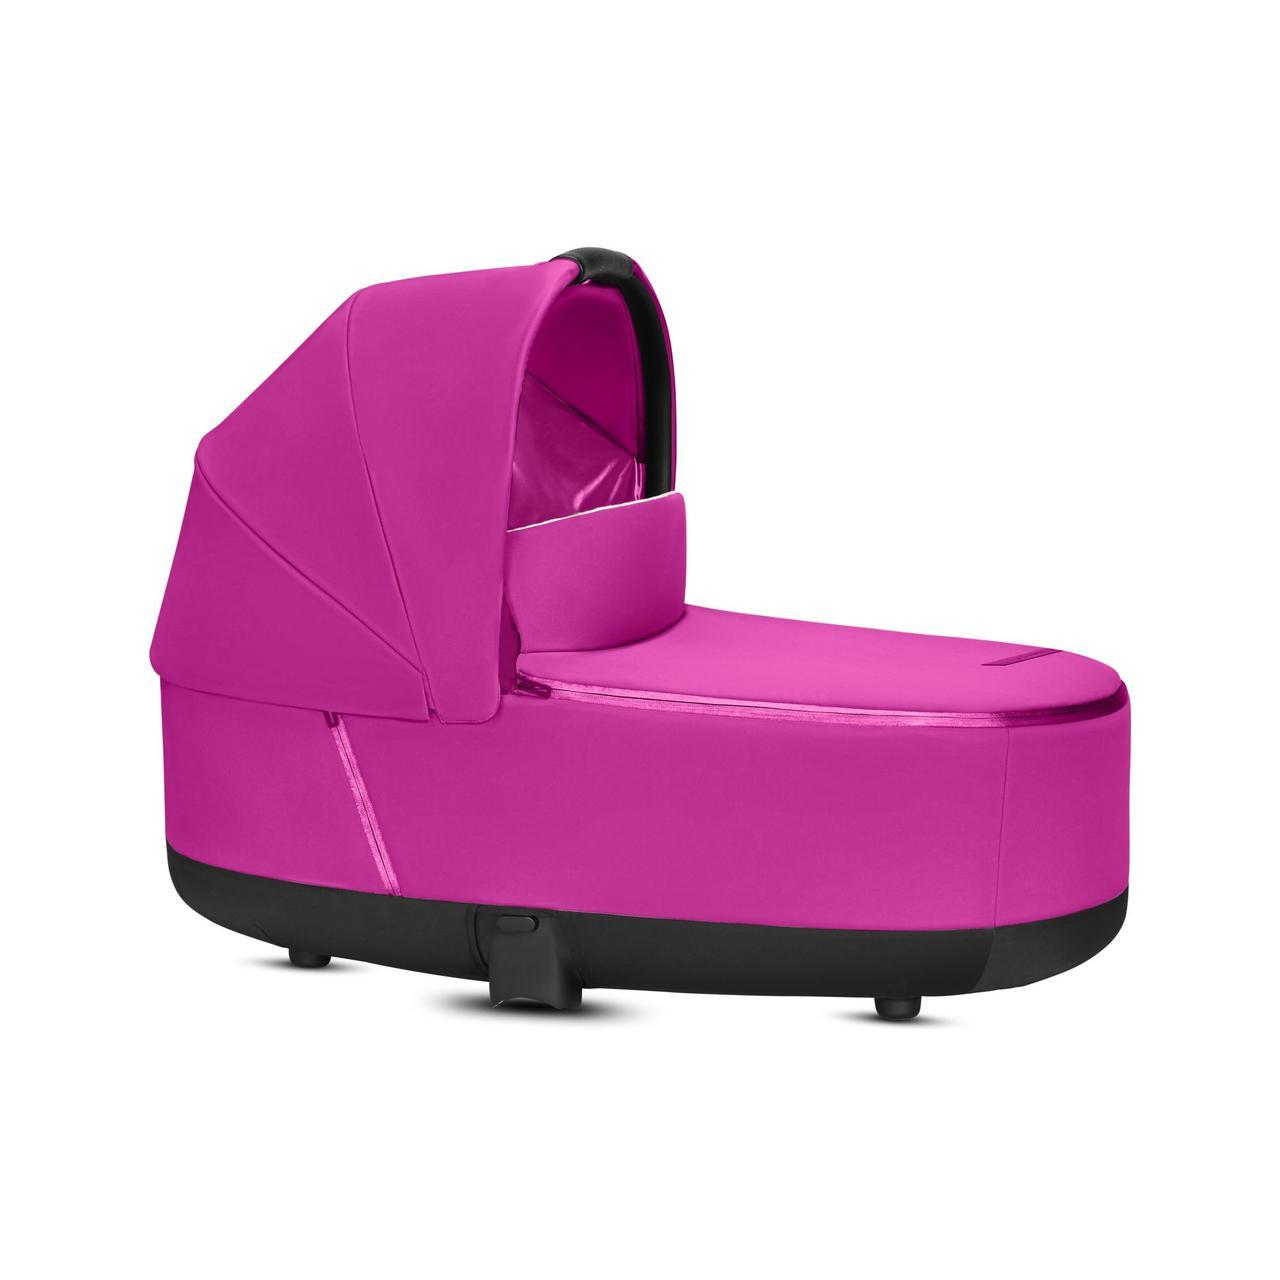 Cybex - Люлька Priam Lux, цвет Fancy Pink